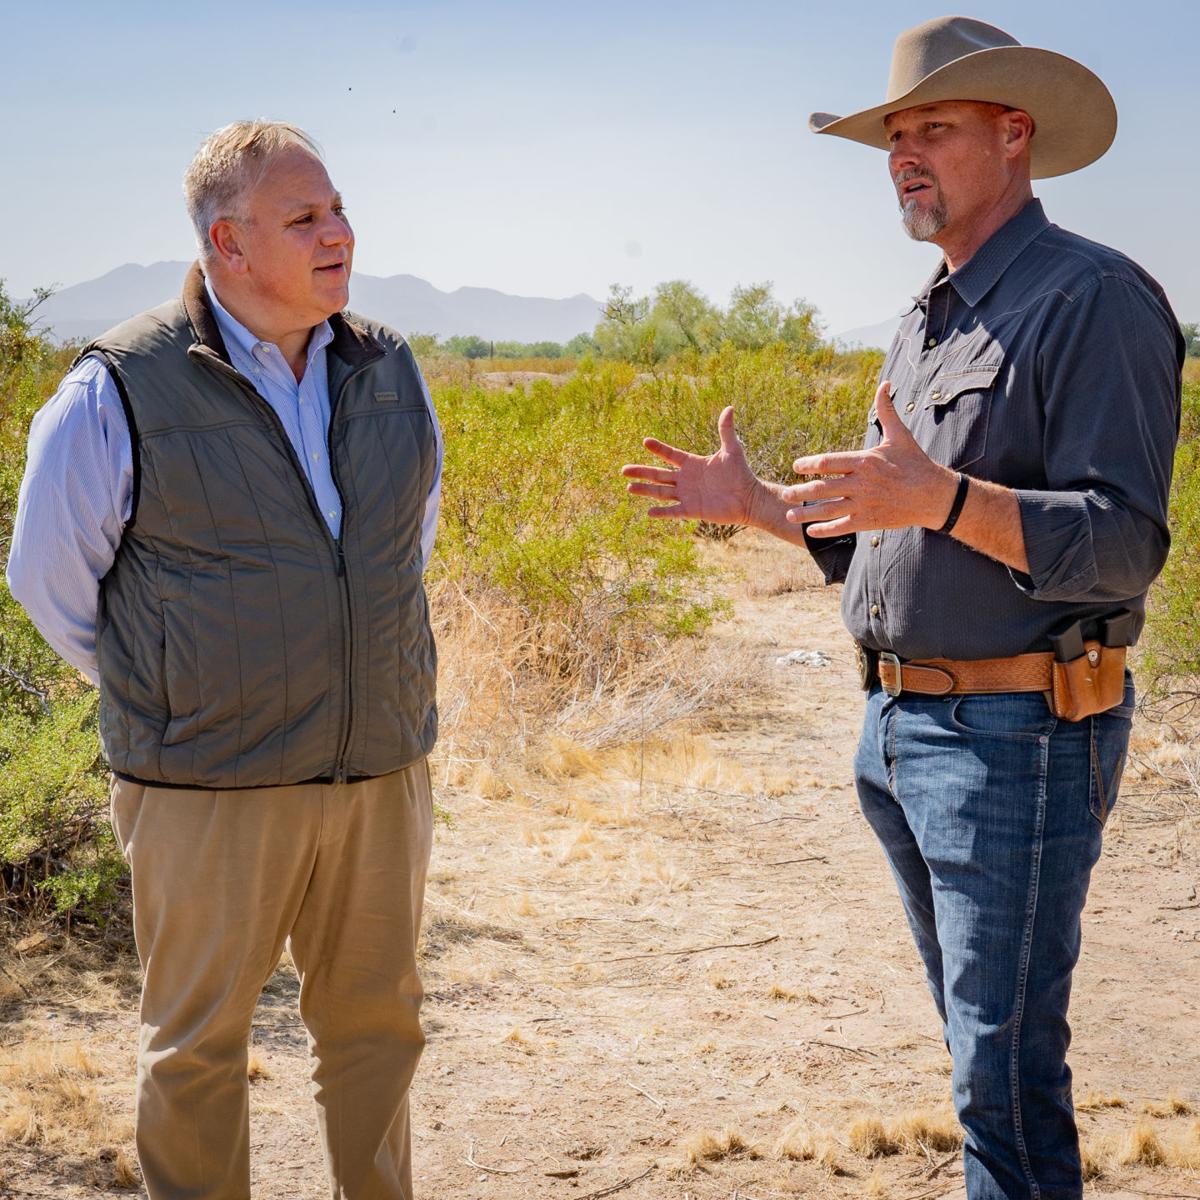 U.S. Secretary of Interior visits Pinal County